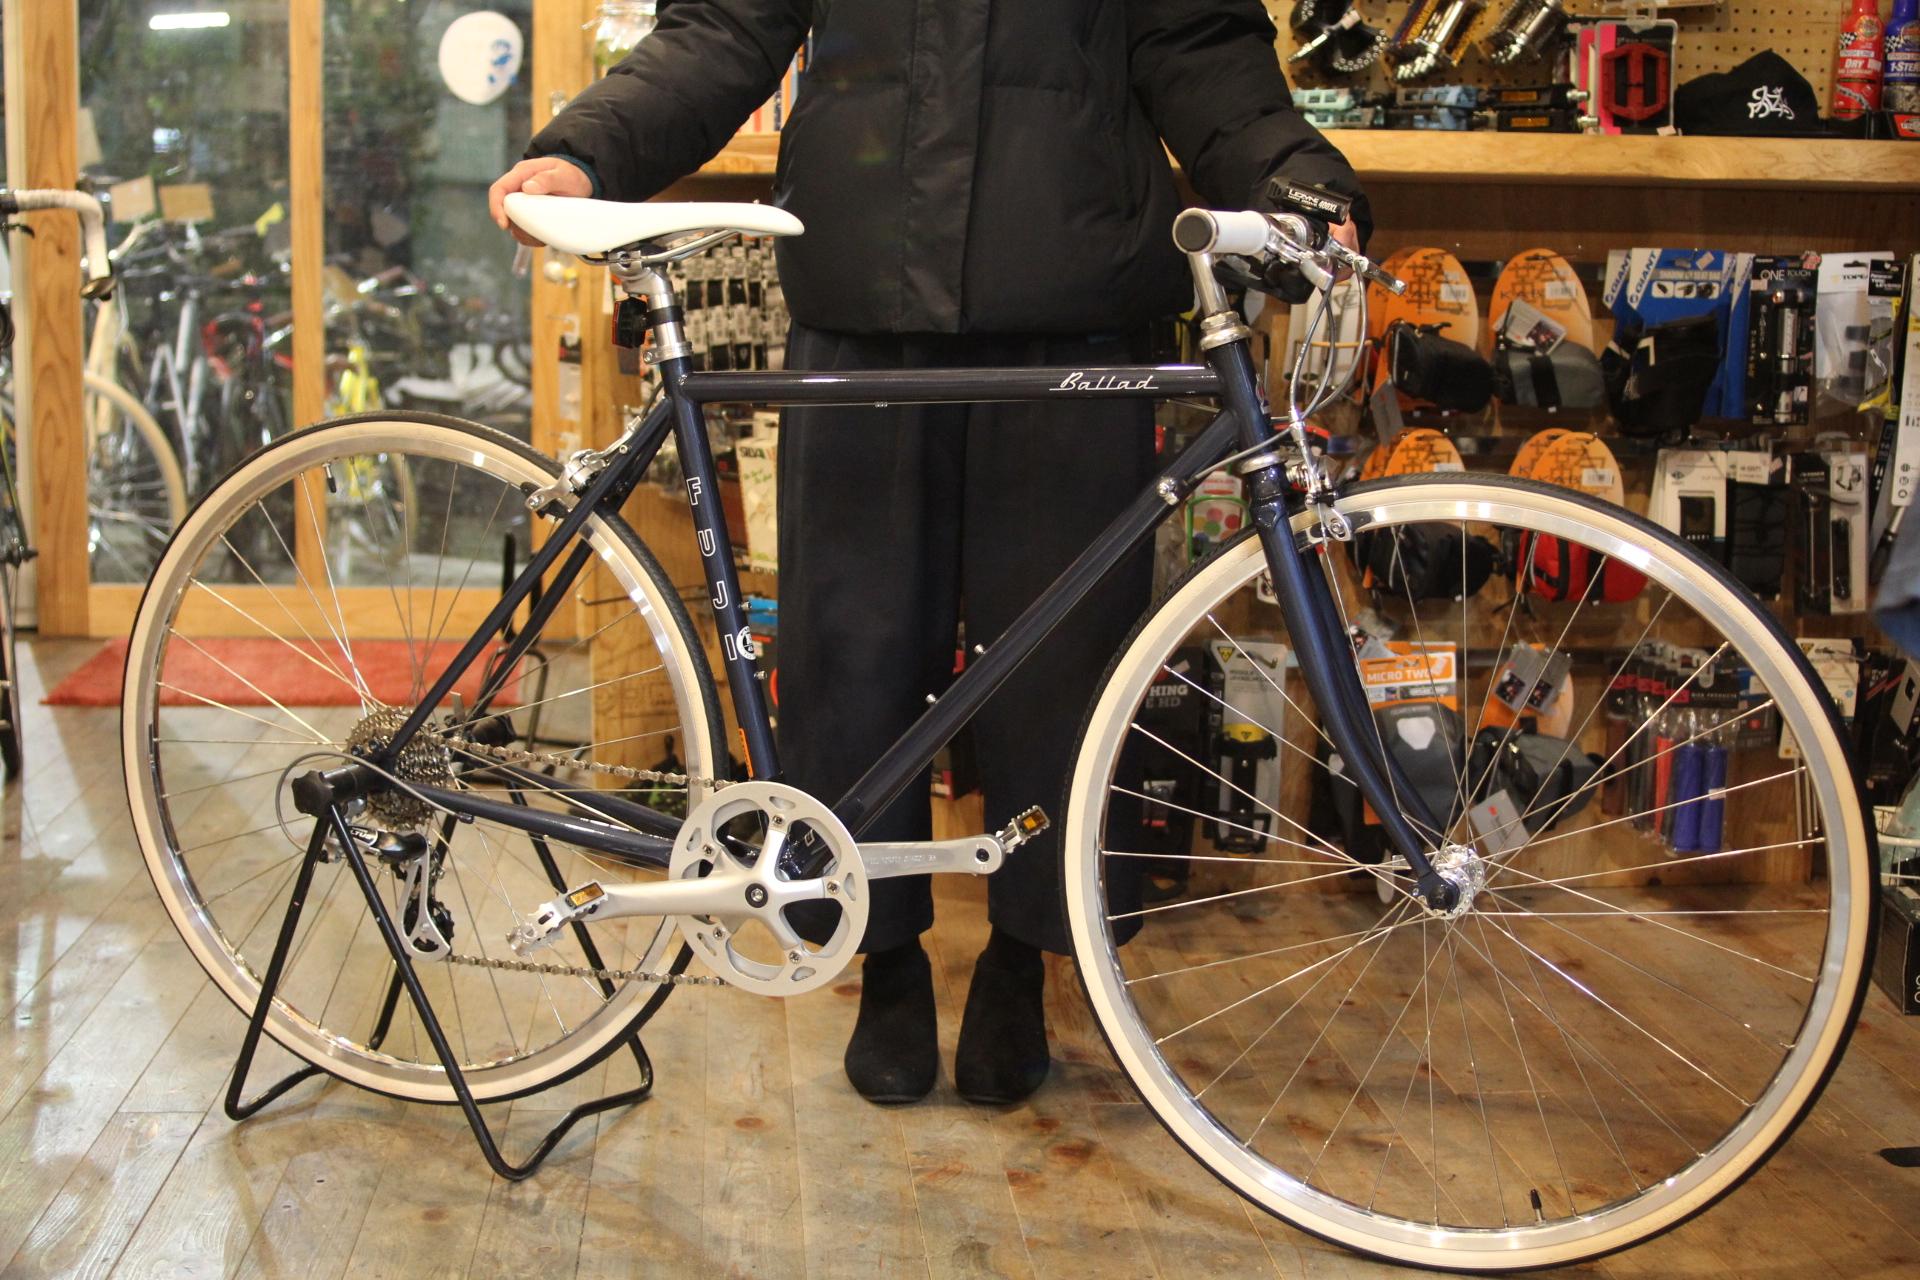 FUJI『Ballad』街乗りにおすすめ、クラシカルなタウンバイク